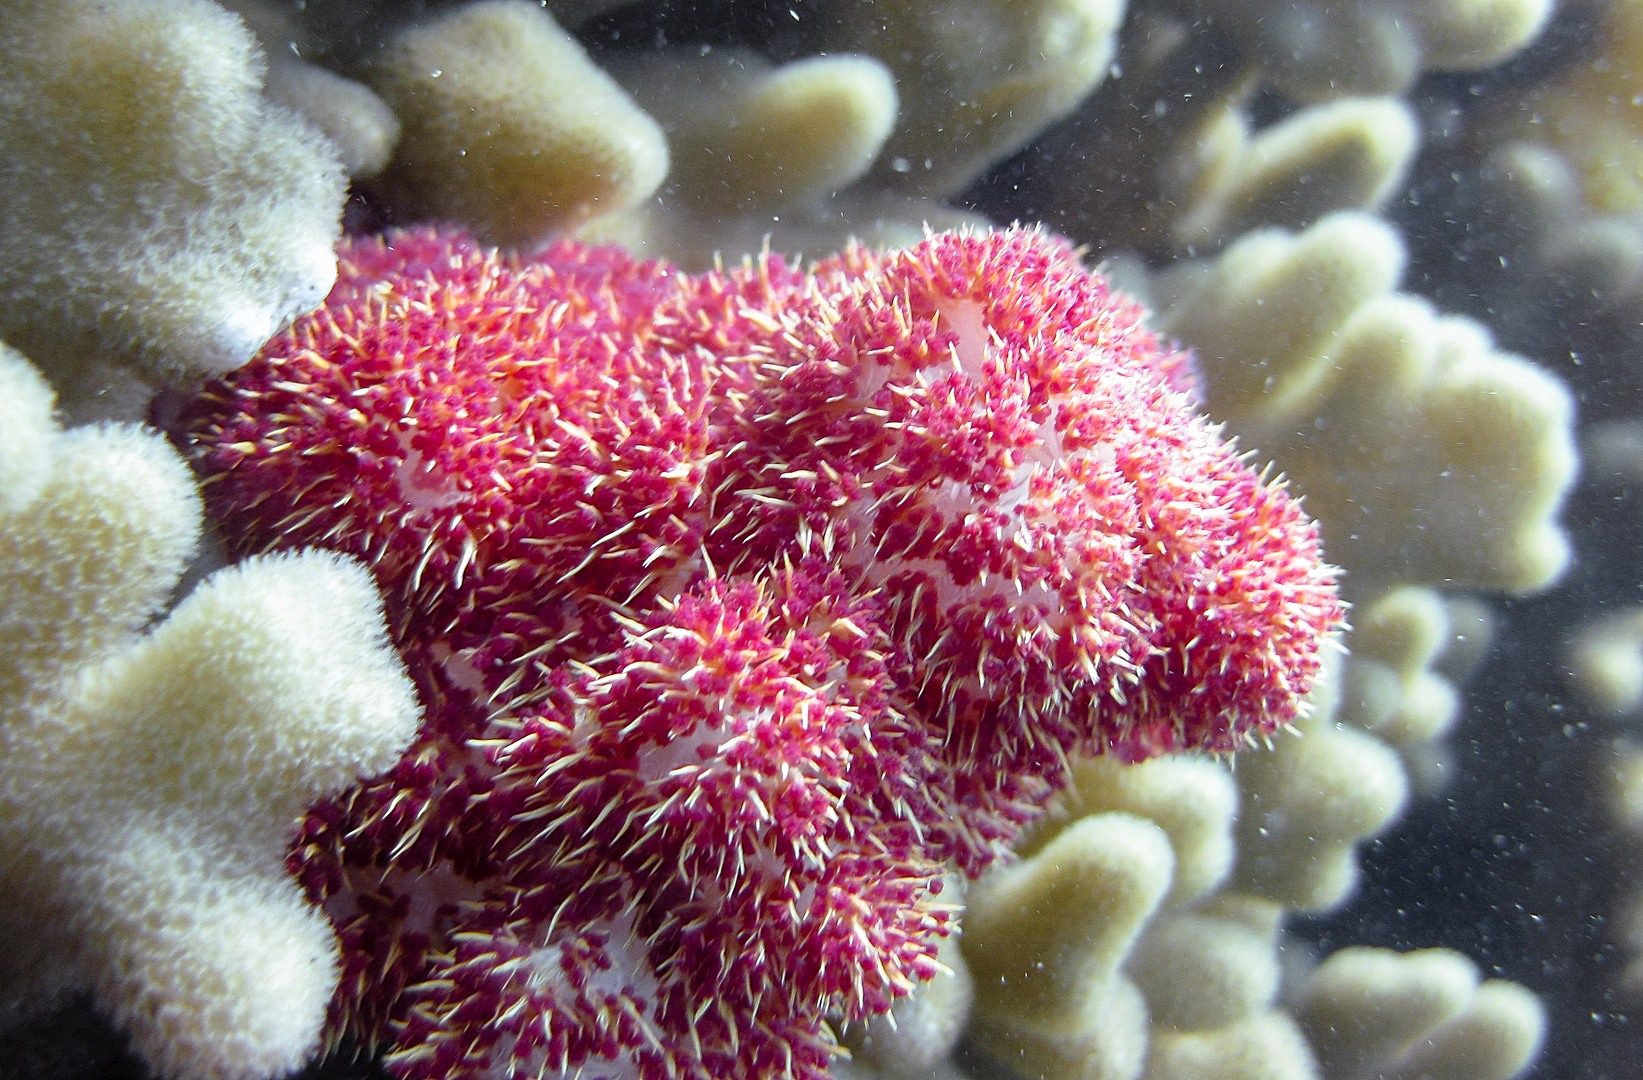 Мягкий коралл Лобофитум, Soft Coral Lobophytum